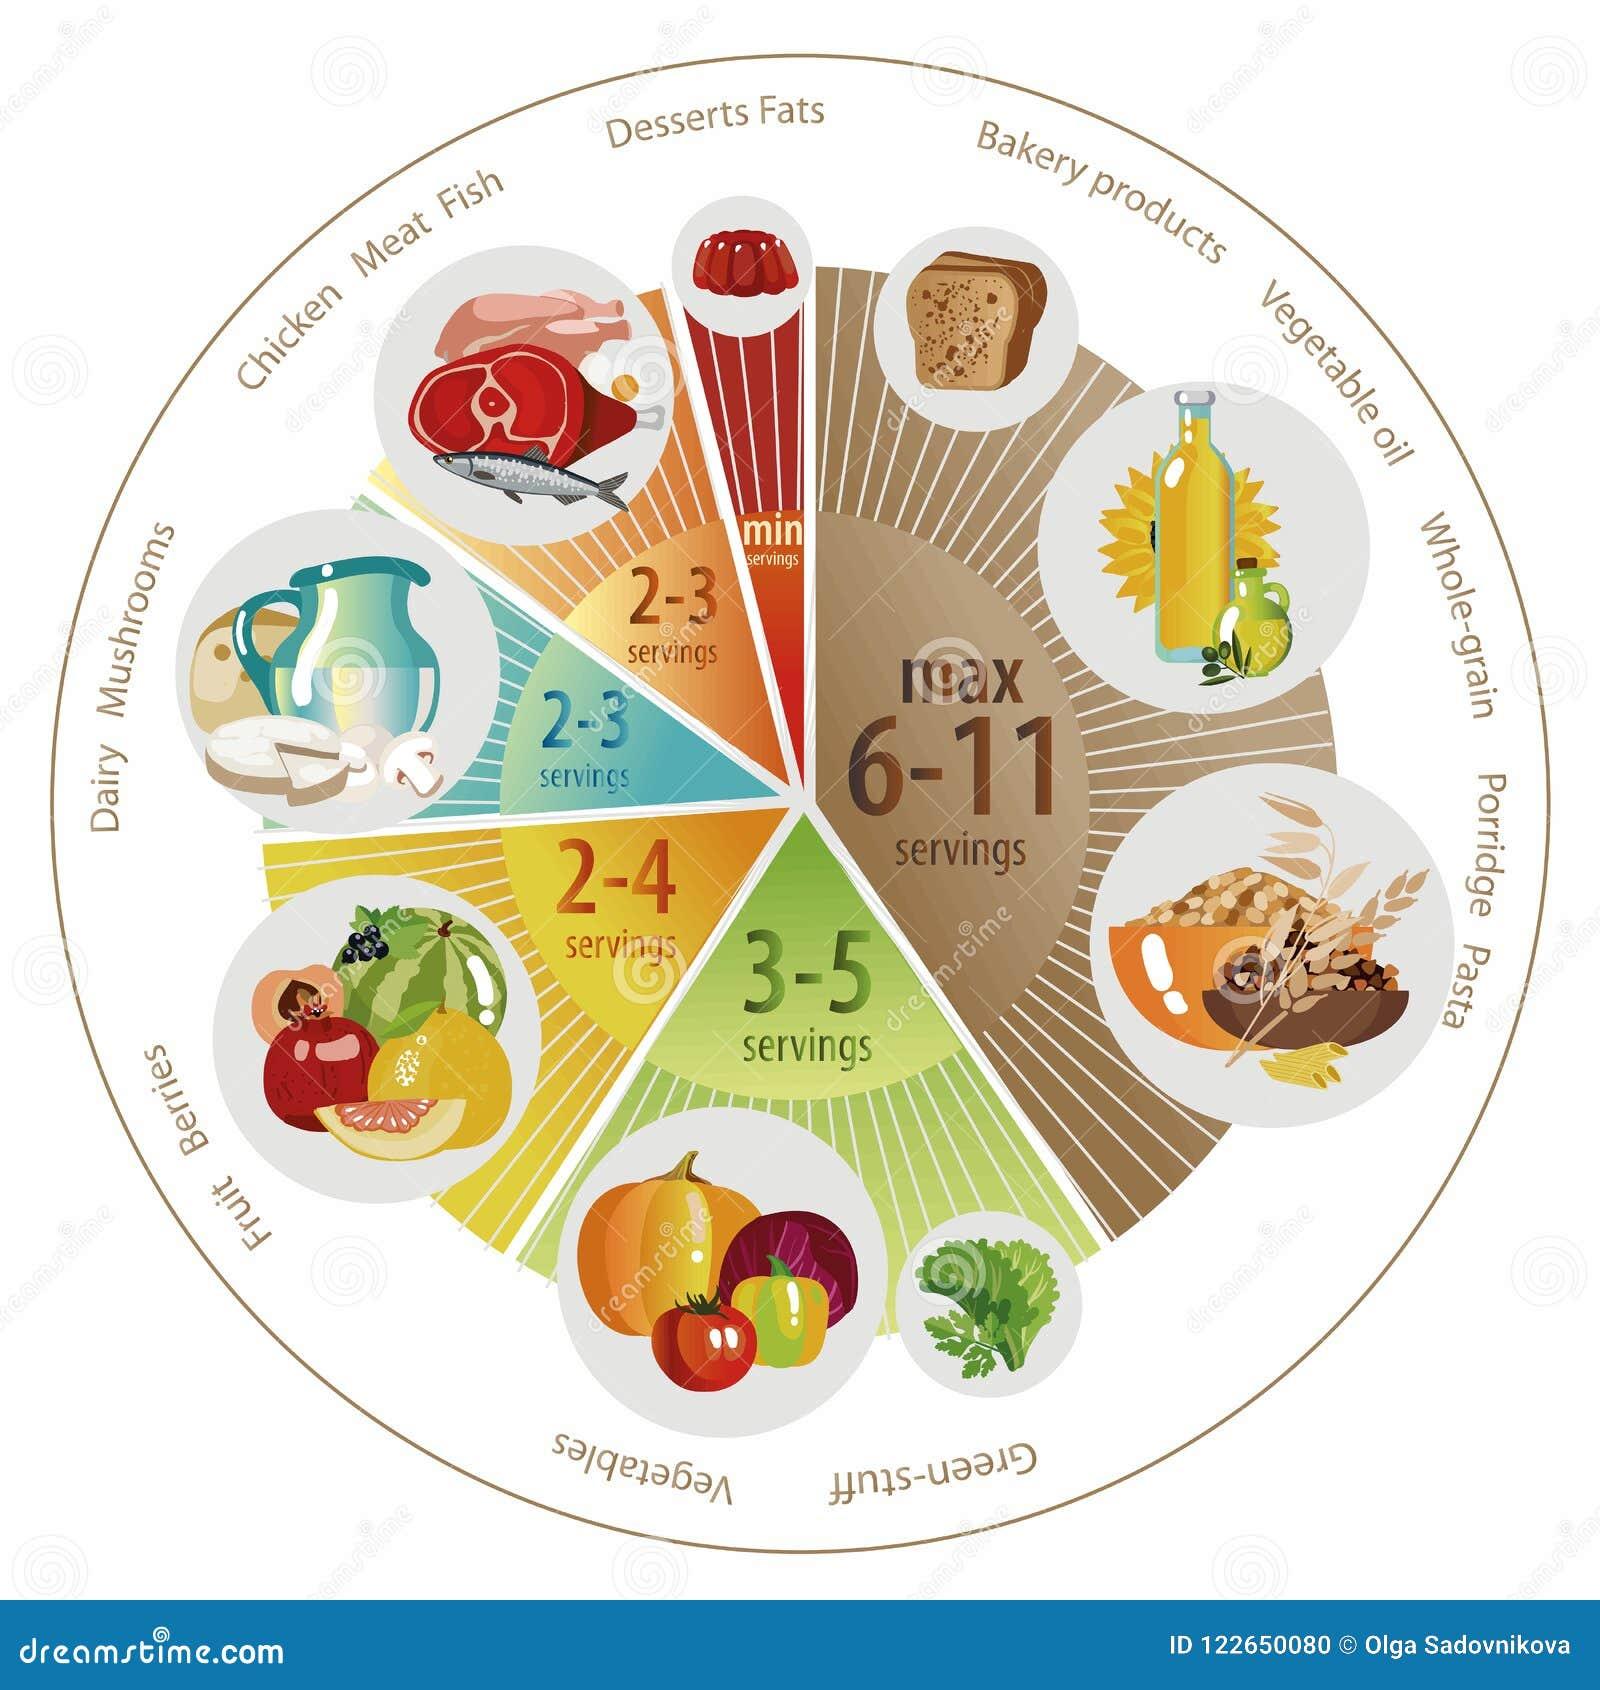 Food Pyramid Pie Chart Stock Illustrations 44 Food Pyramid Pie Chart Stock Illustrations Vectors Clipart Dreamstime